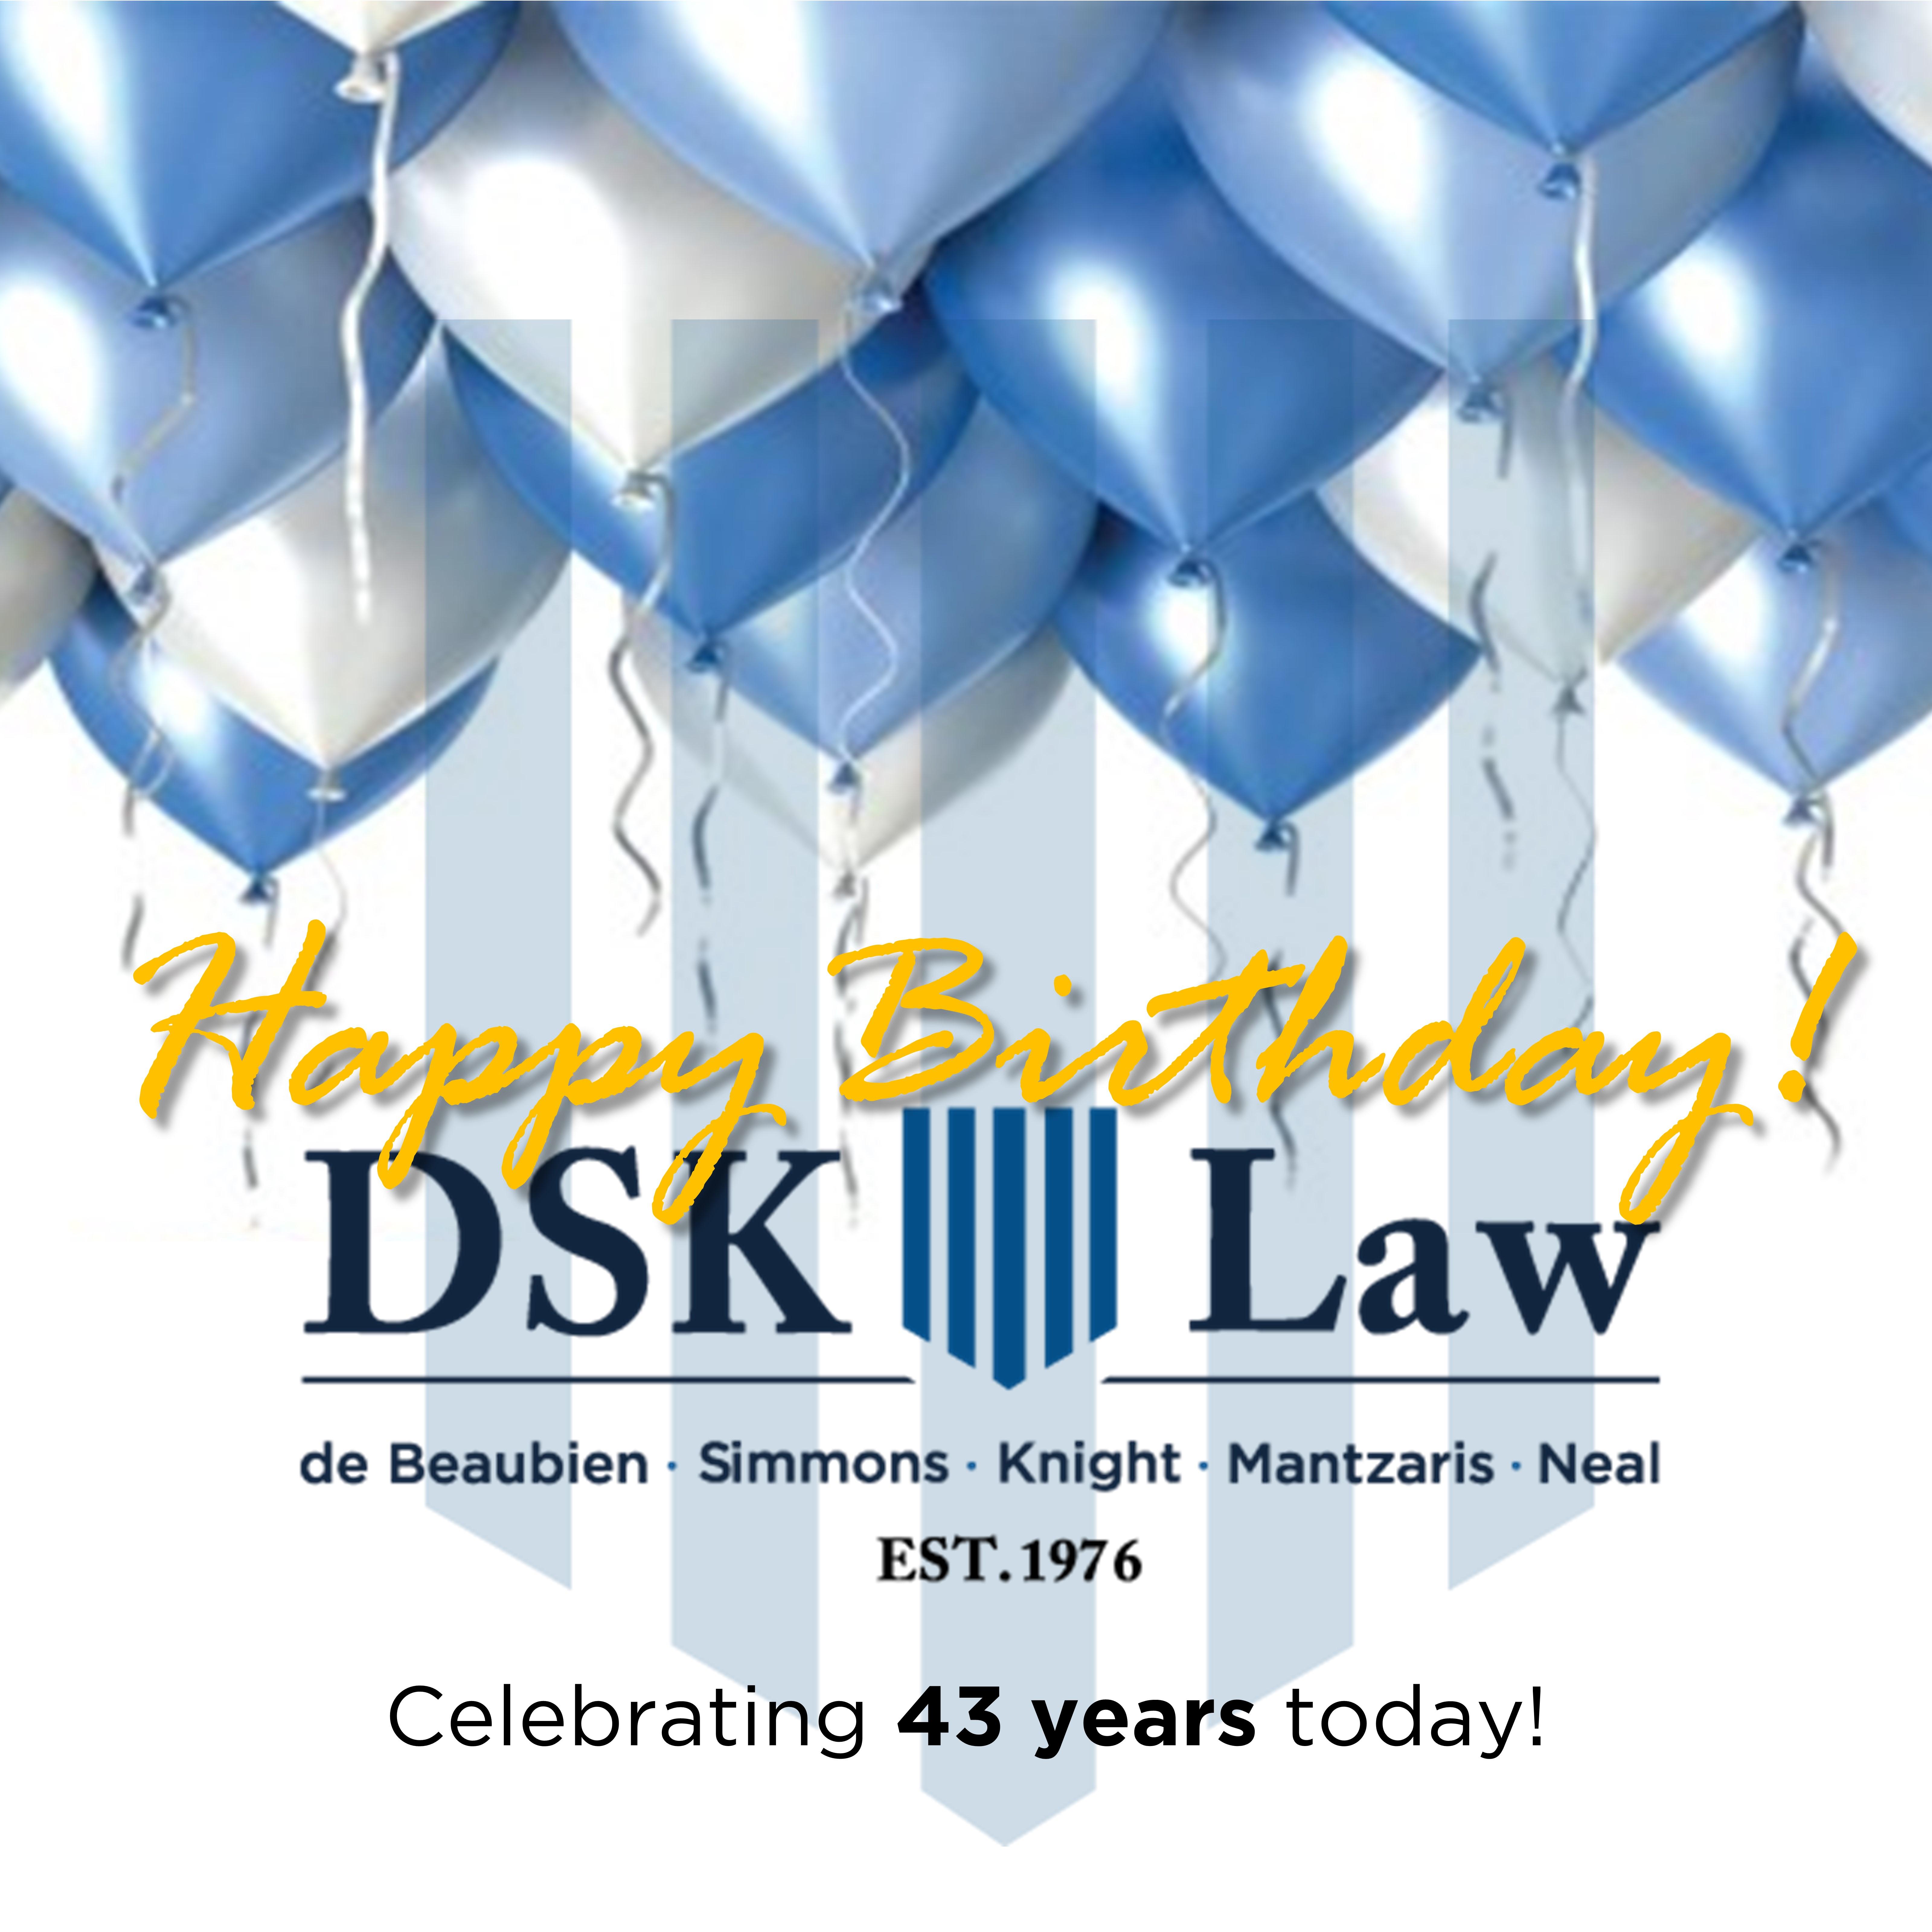 Happy Birthday DSK Law!